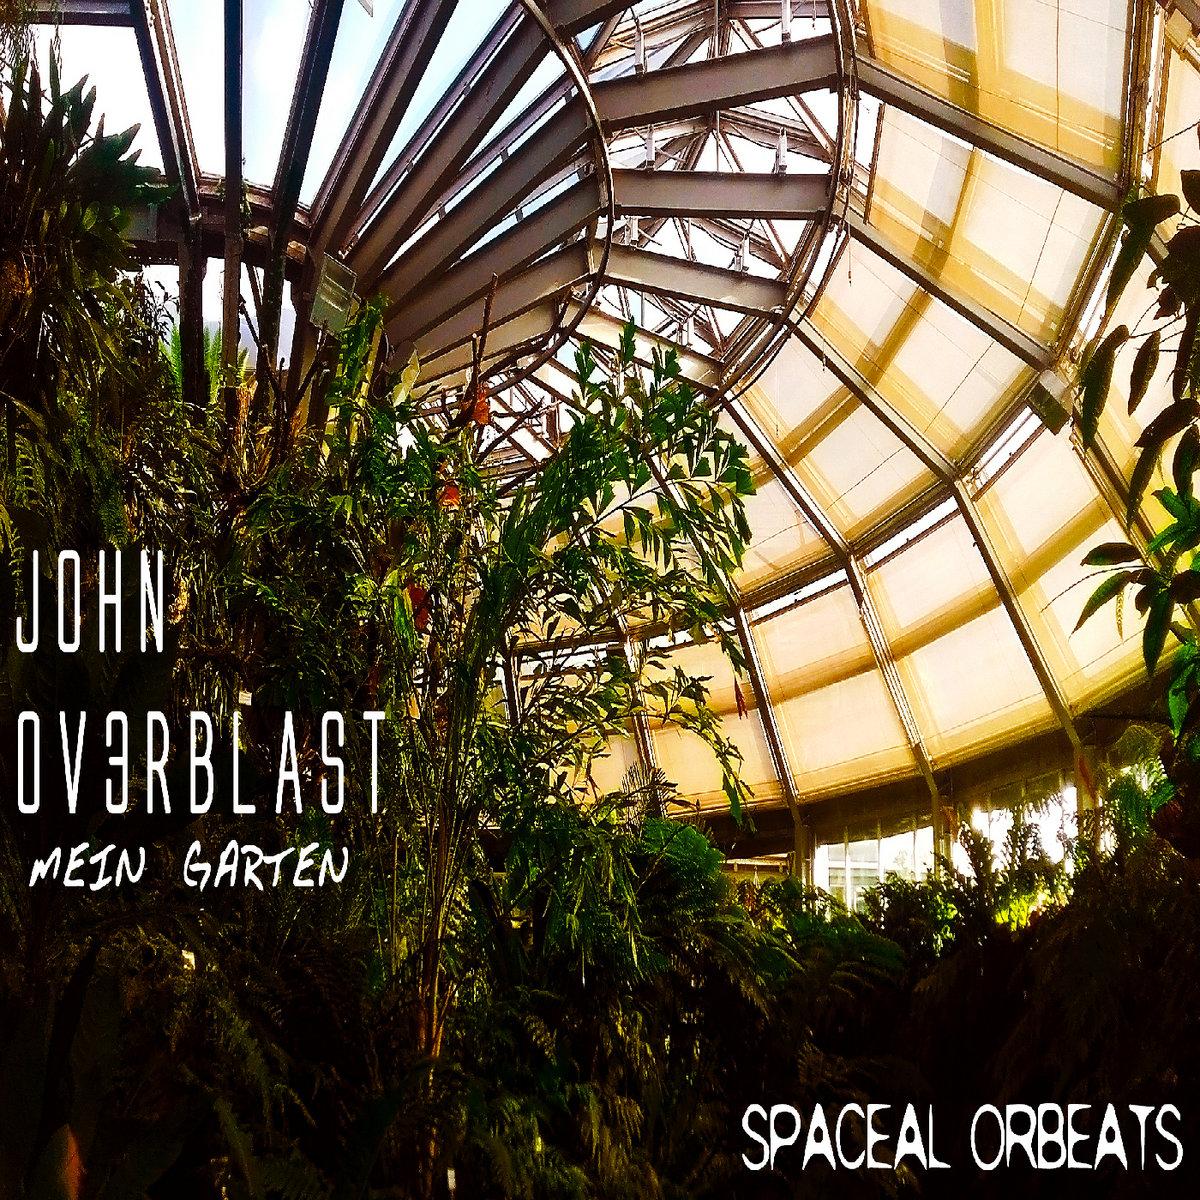 Mein garten  John Ov3rblast - Mein Garten | Spaceal Orbeats